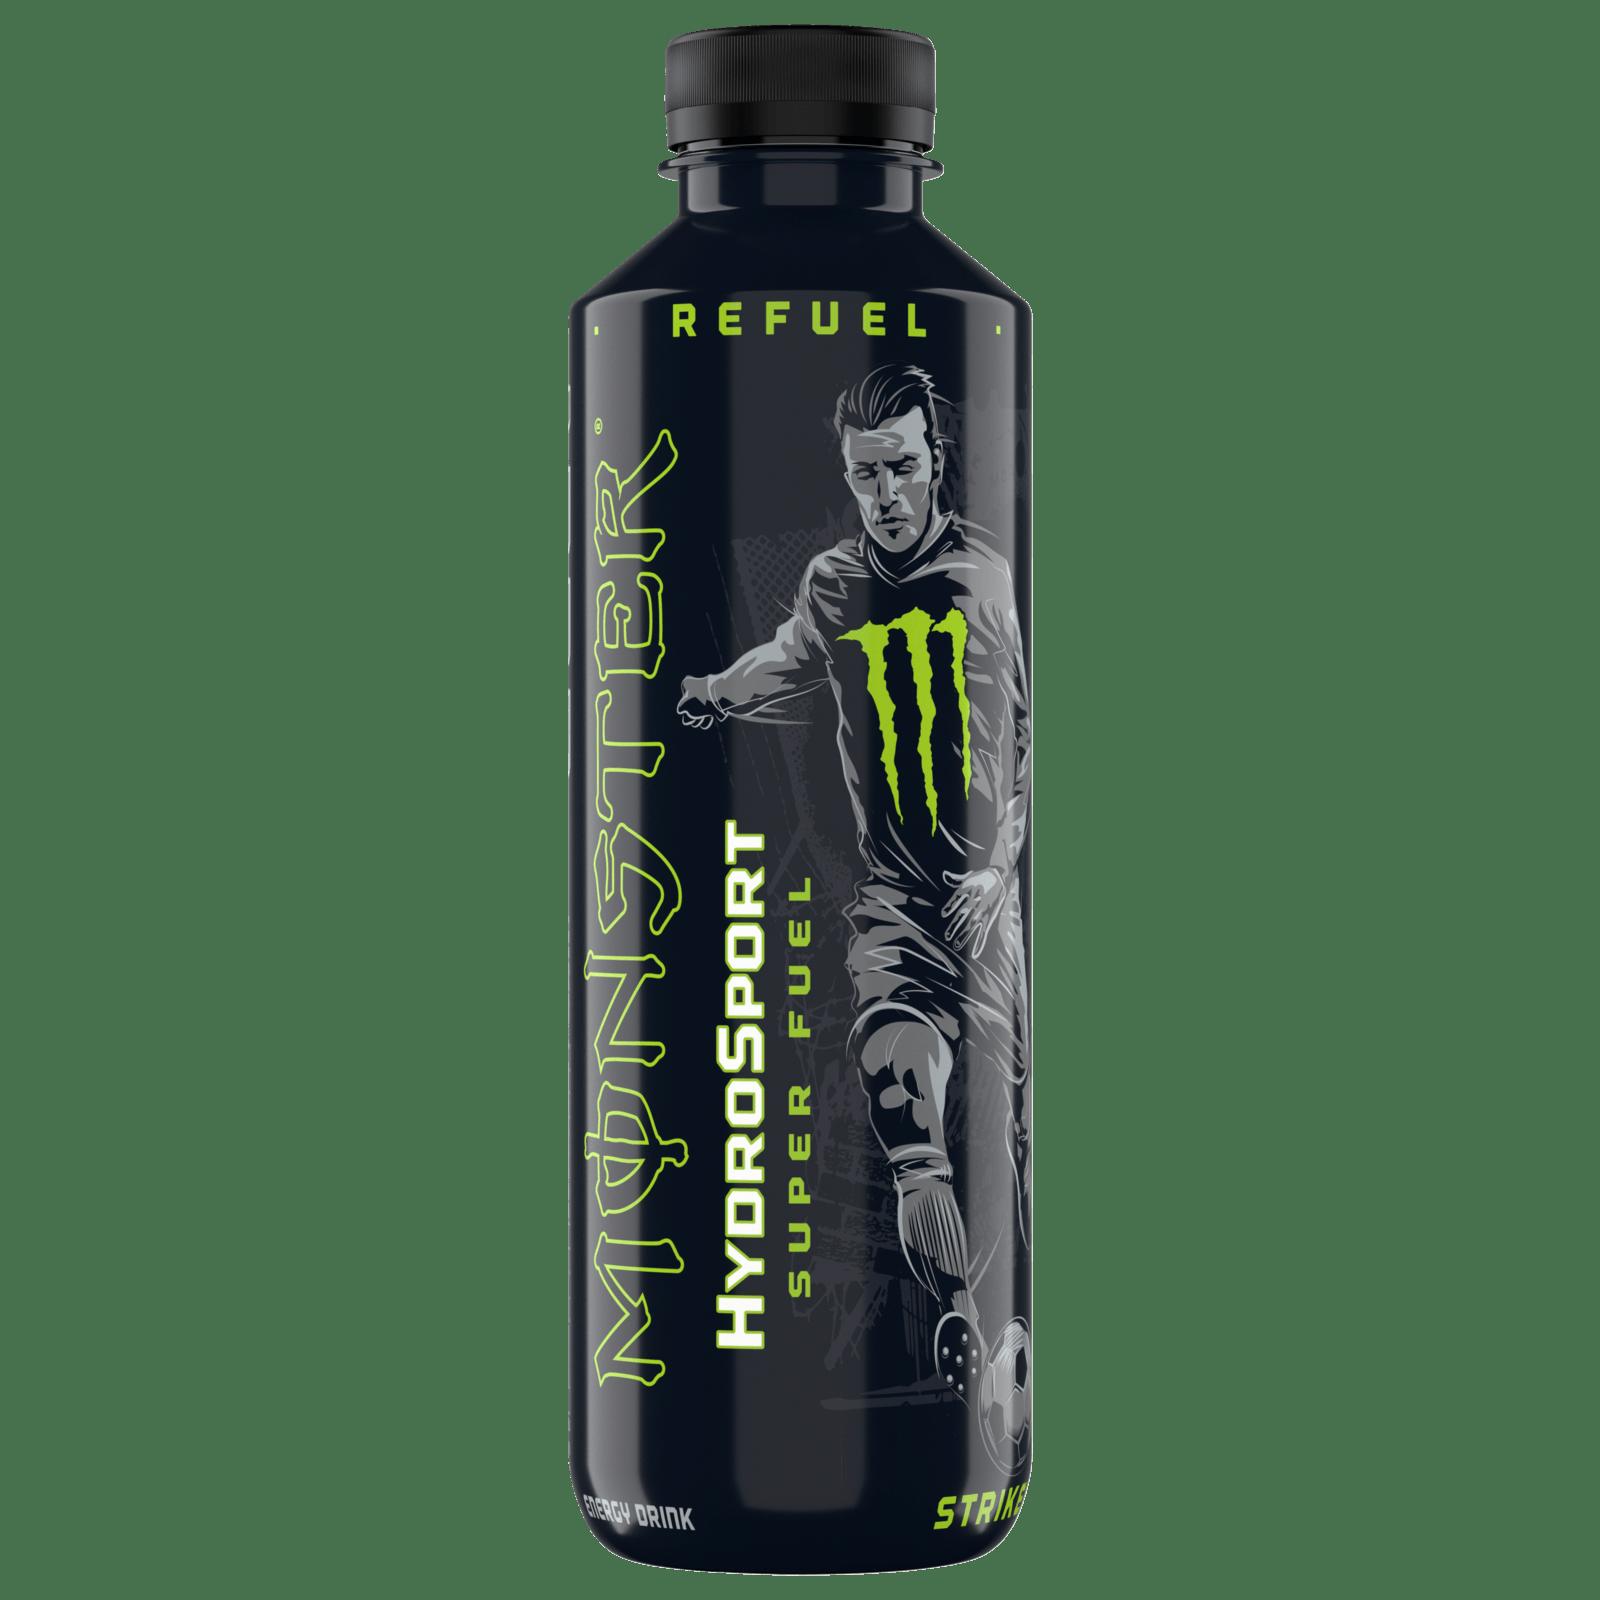 monster_hydrosport_refuel_super_fuel_striker_energy_drink_650ml_flasche